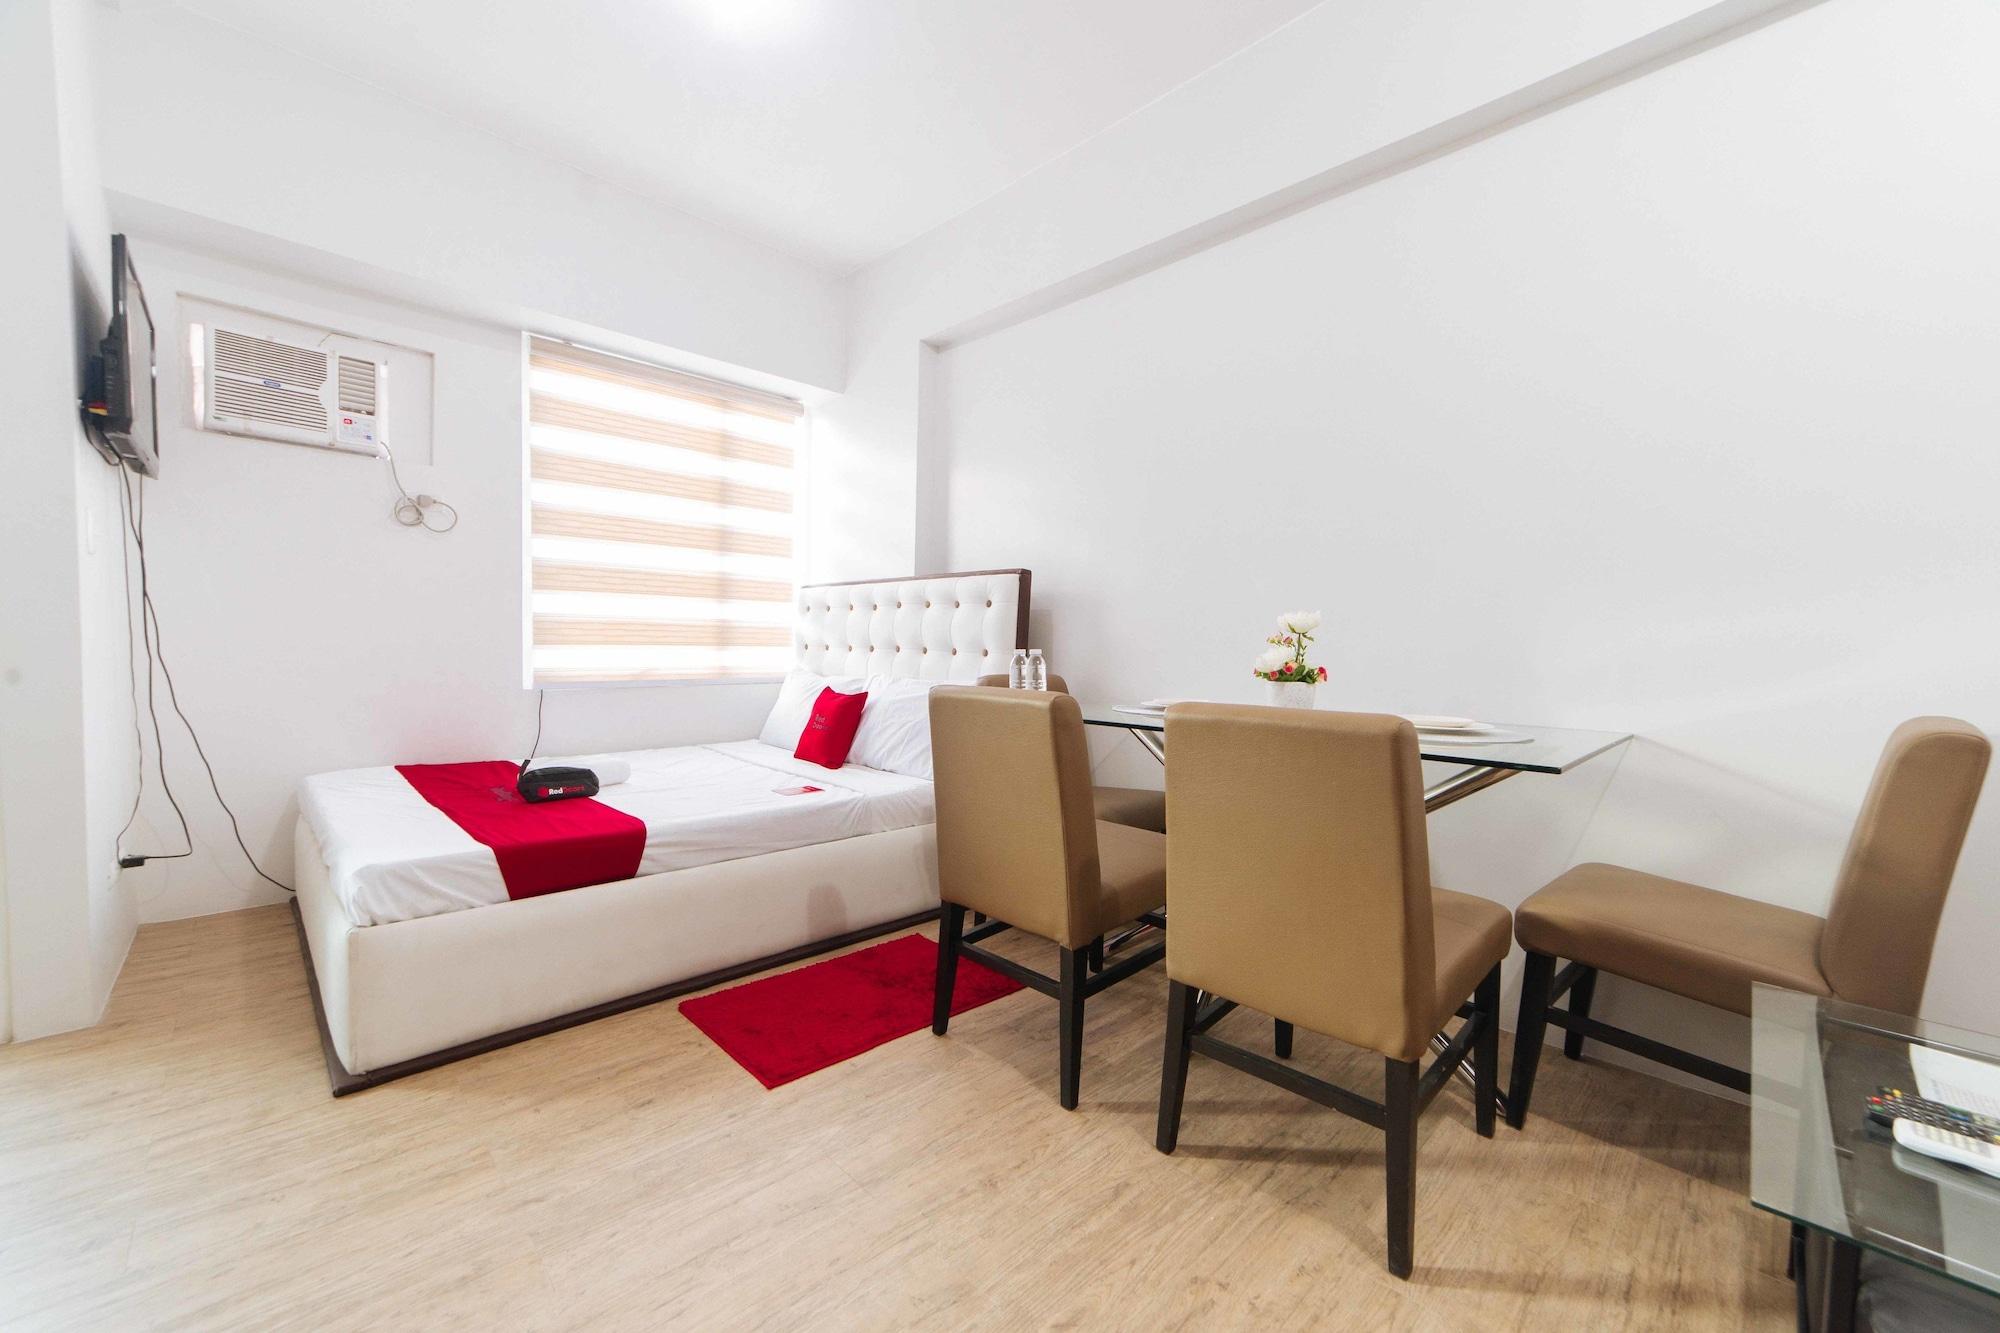 RedDoorz Premium @ Anuva Residences, Muntinlupa